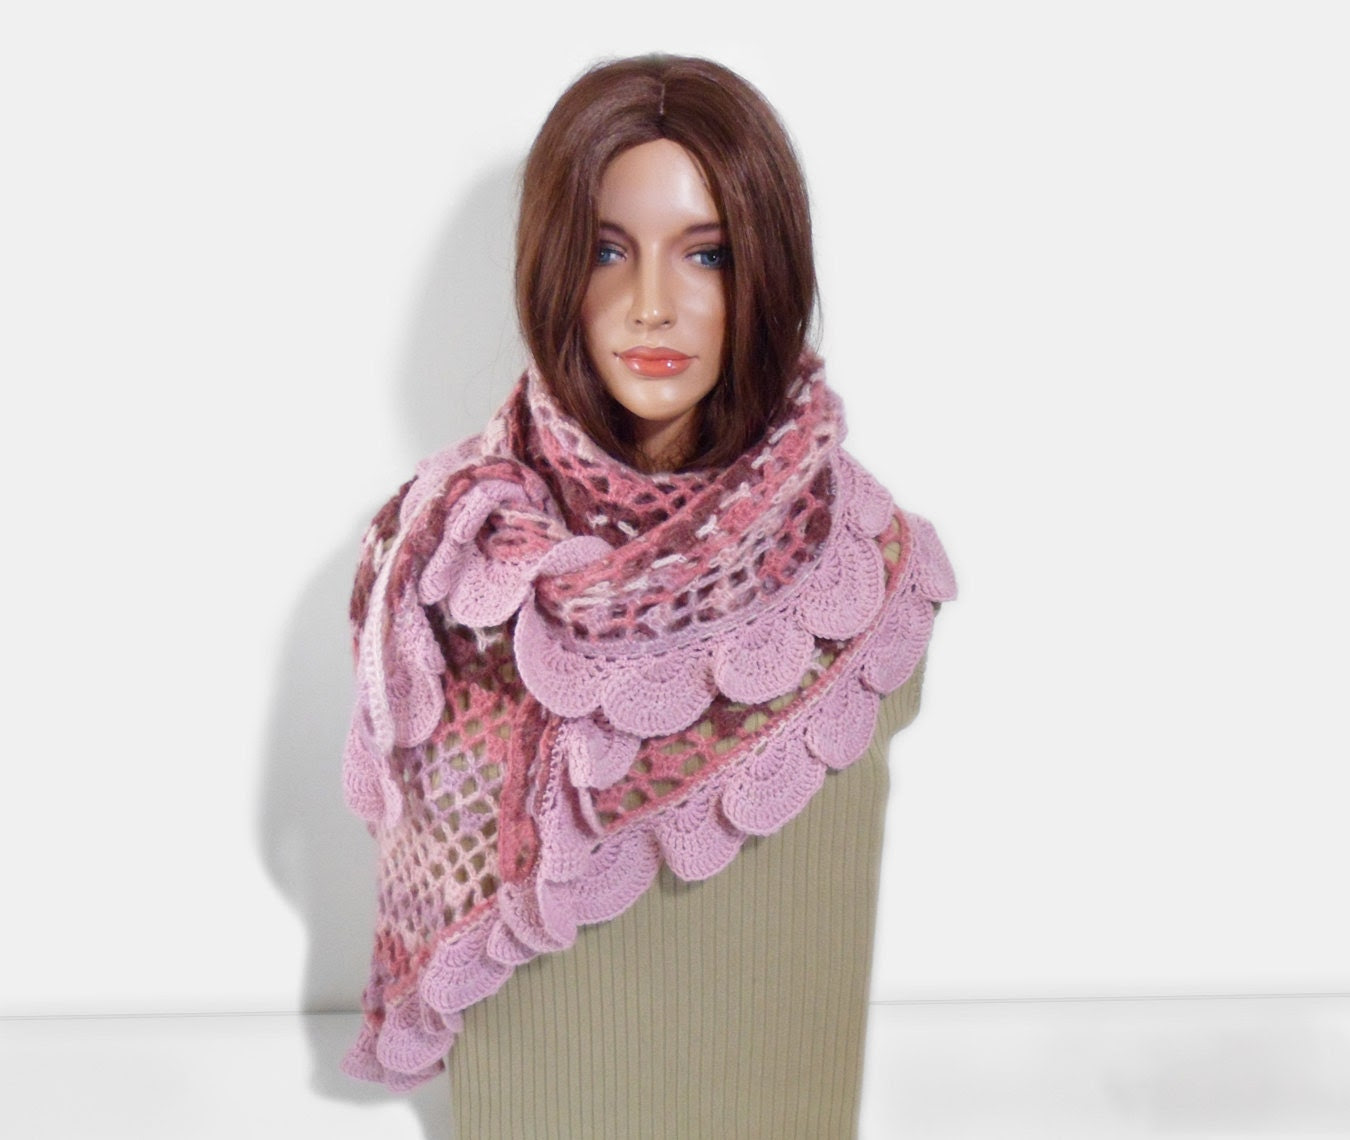 Crochet Shawl, Handmade Triangle Shawl, Winter Accessory in Pink - UnlimitedCraftworks